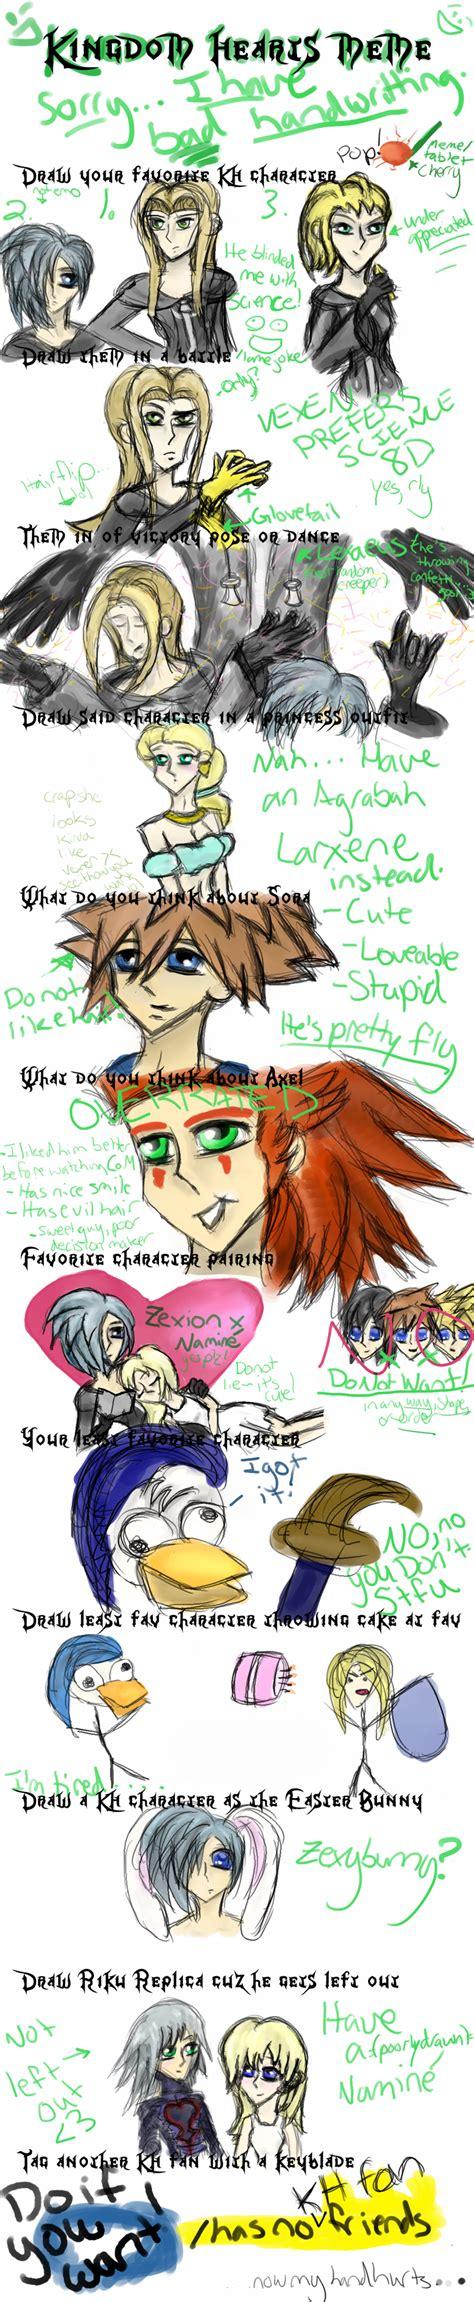 Kingdom Hearts Memes - kingdom hearts meme by ladyoflies on deviantart